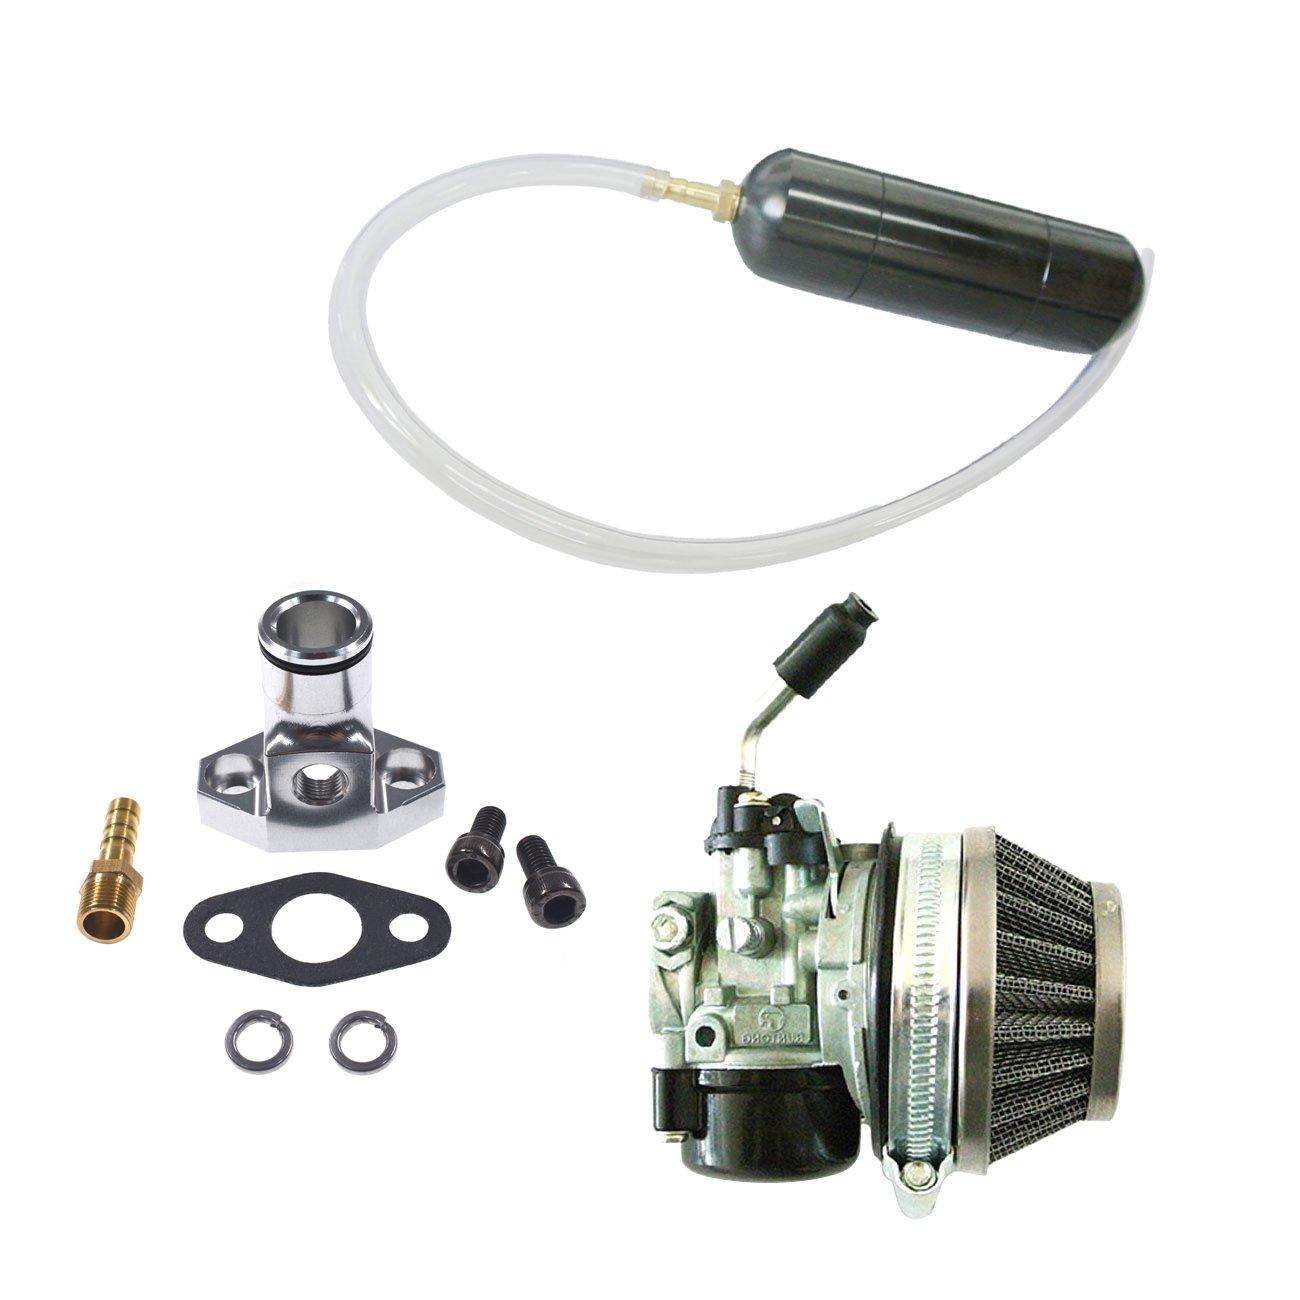 JRL Carburetor/&Black Gas Power Boost Bottle For 66cc 80cc Engine Motorized Bicycle